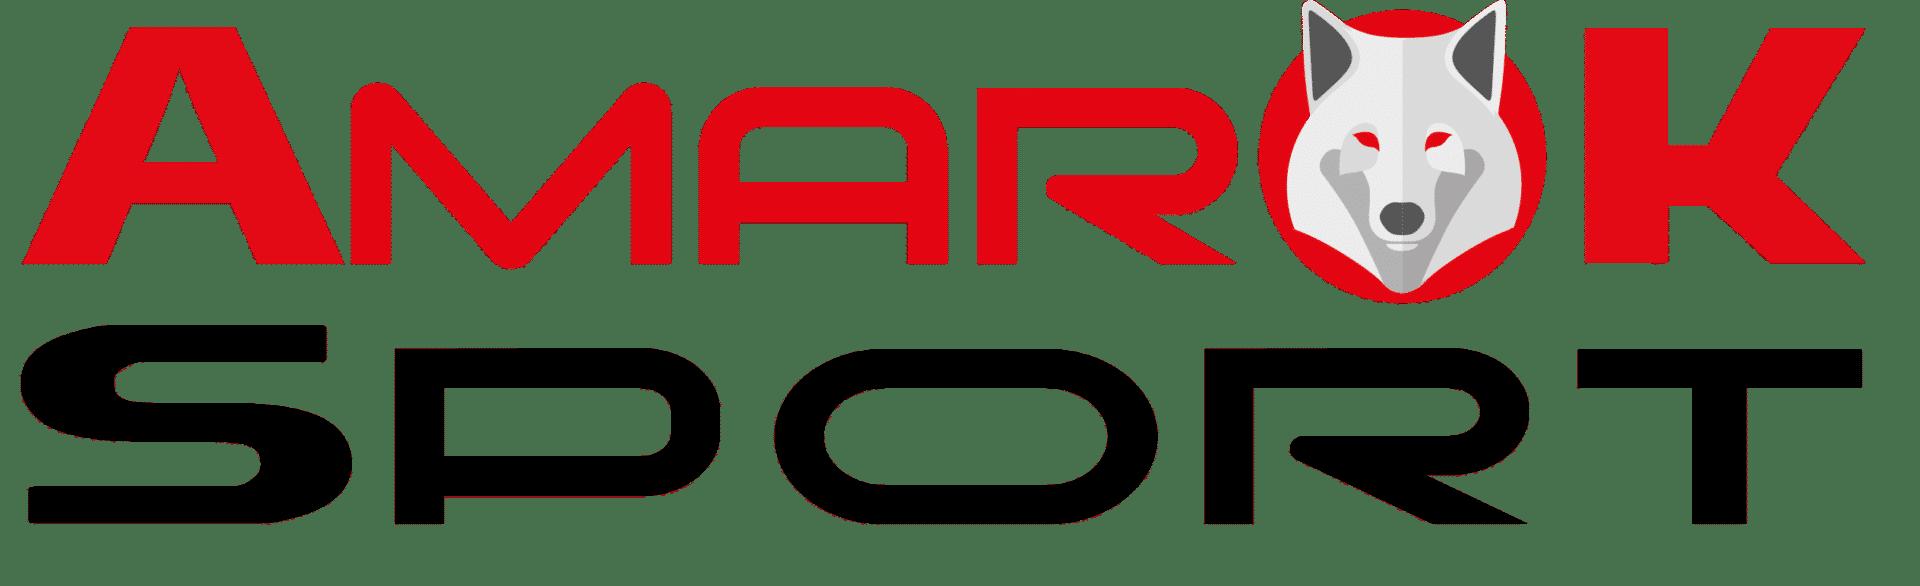 LOGO AMAROK RIDE 2